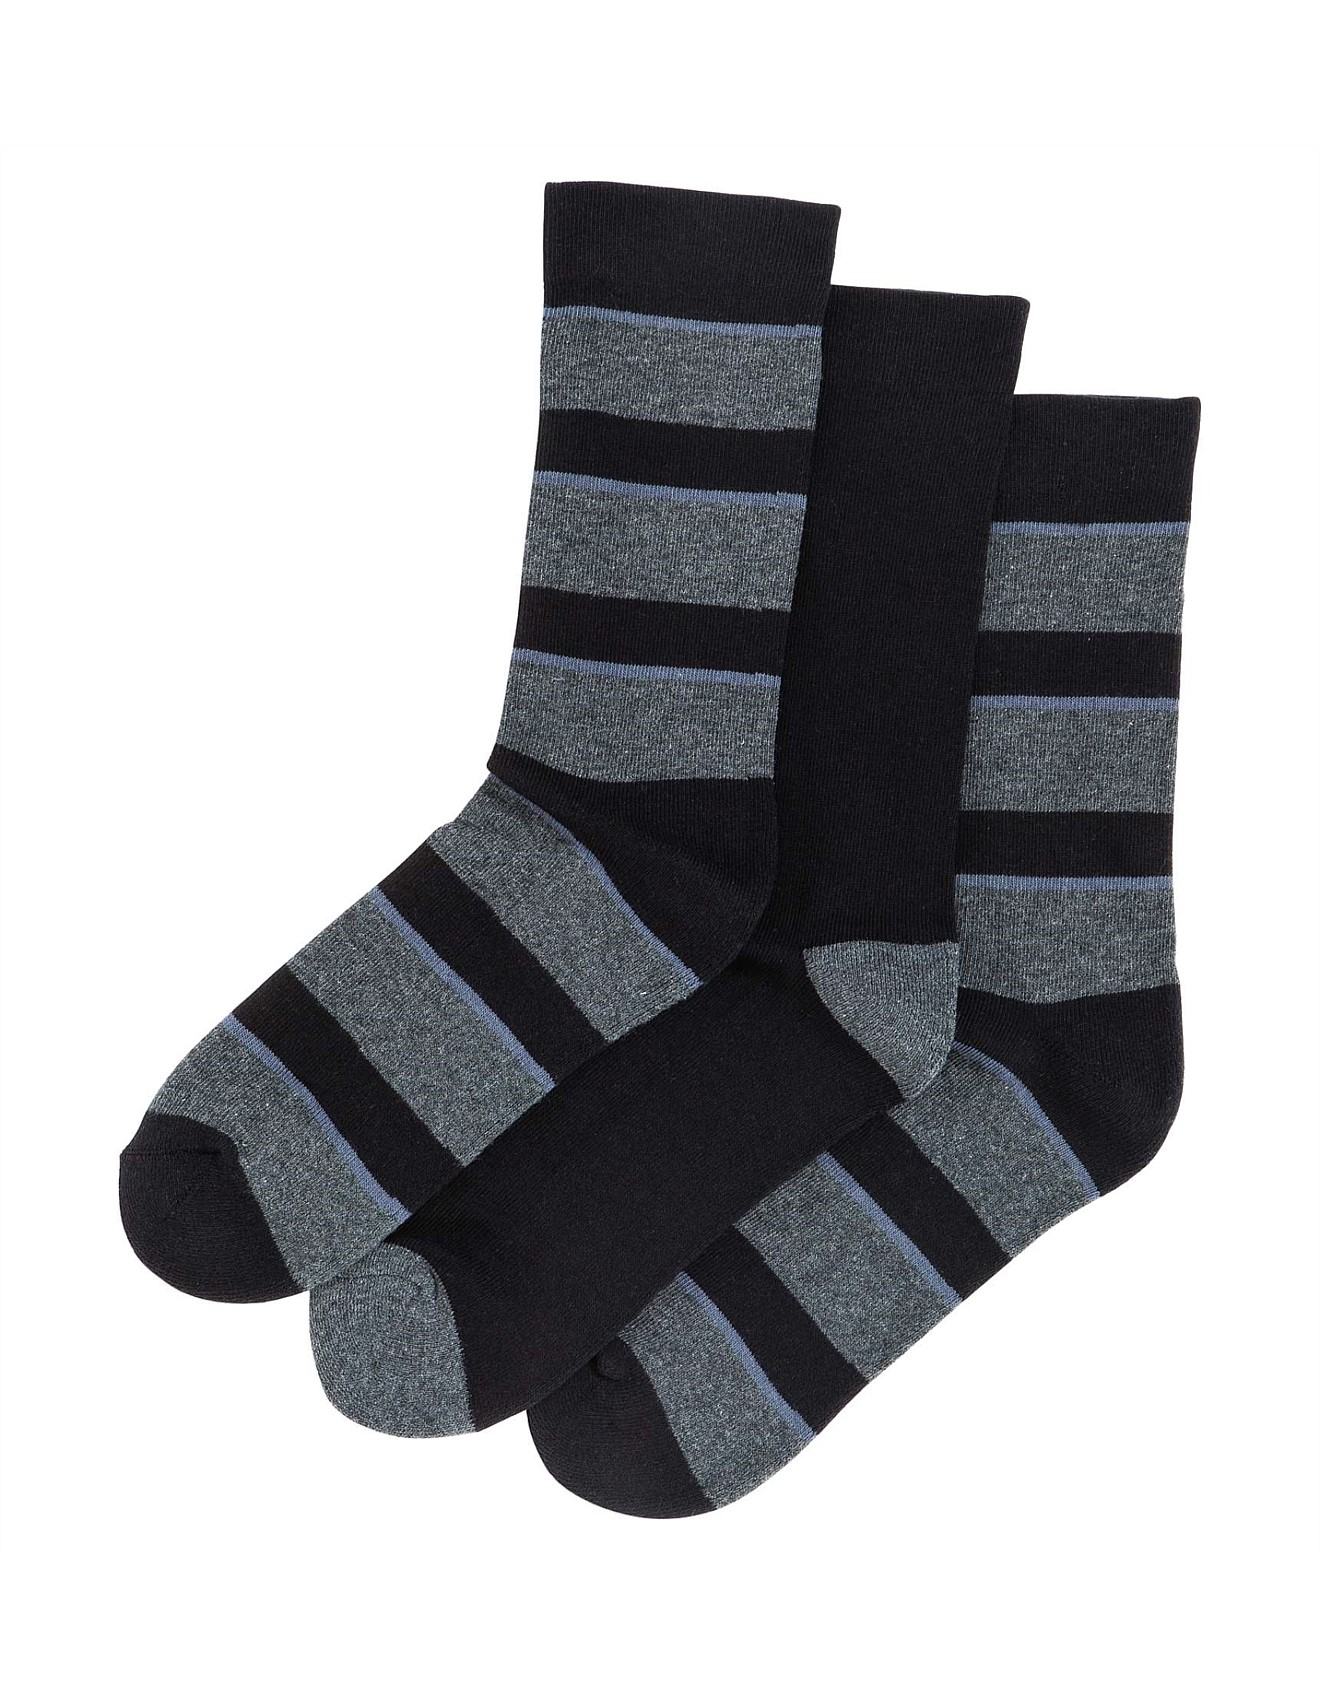 d599b8bdc7 Thick Bold Stripe Comfort Crew Socks 3 Pack